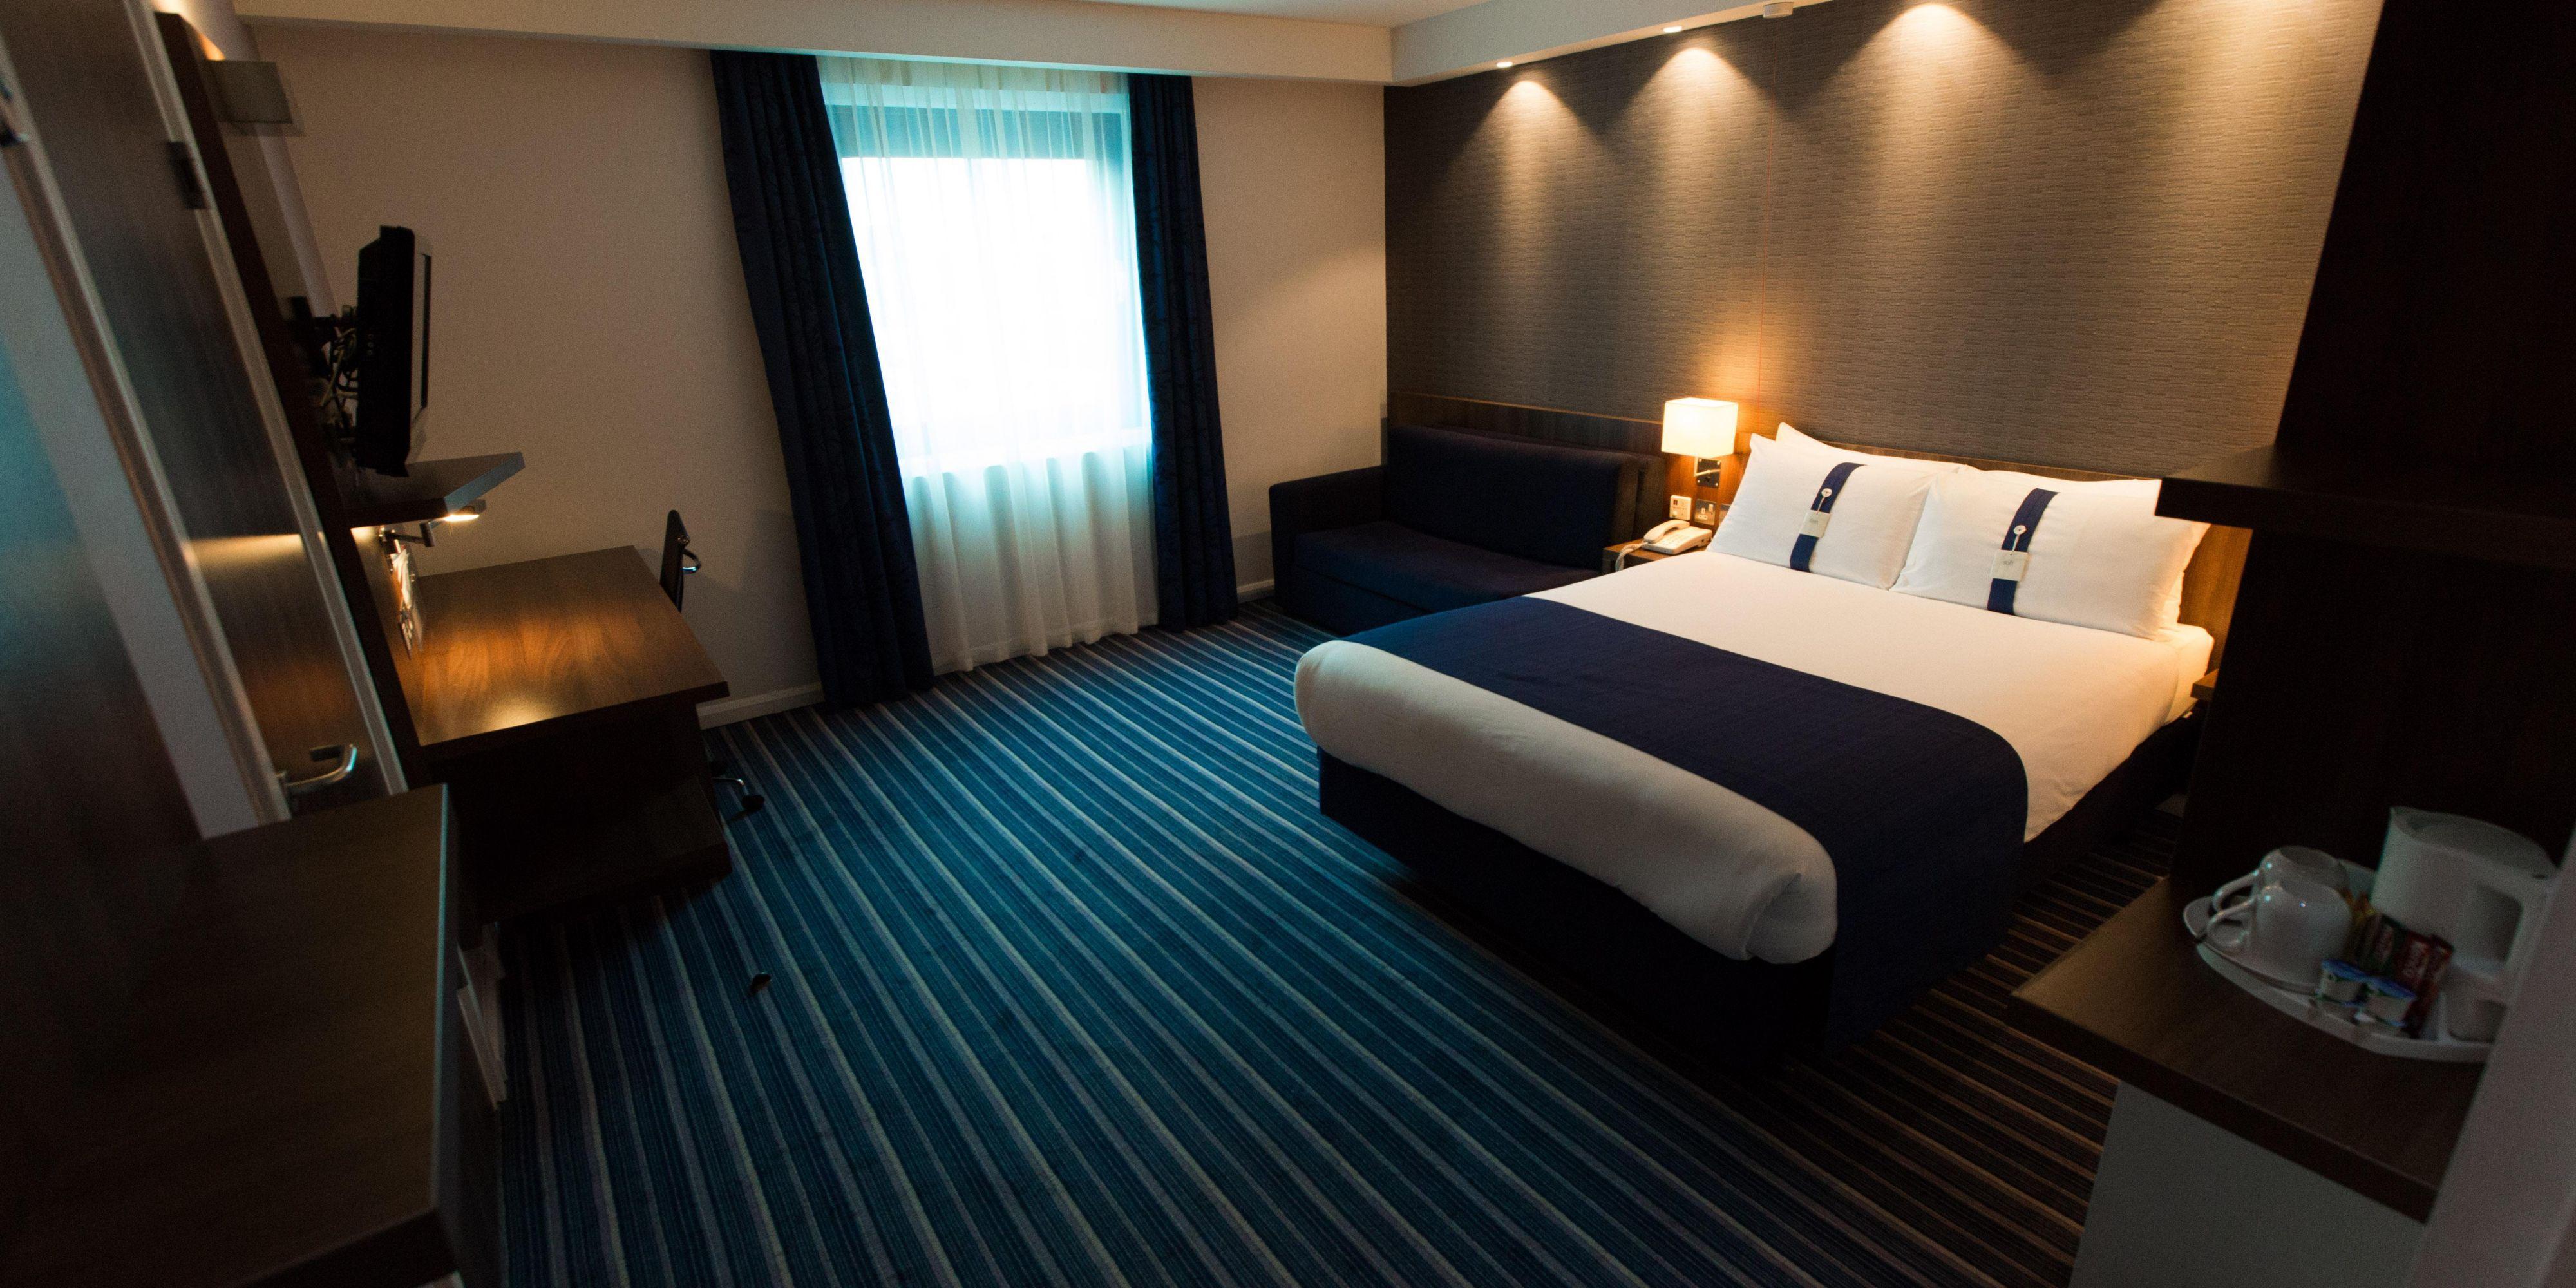 Holiday Inn Express London 3183026942 2x1